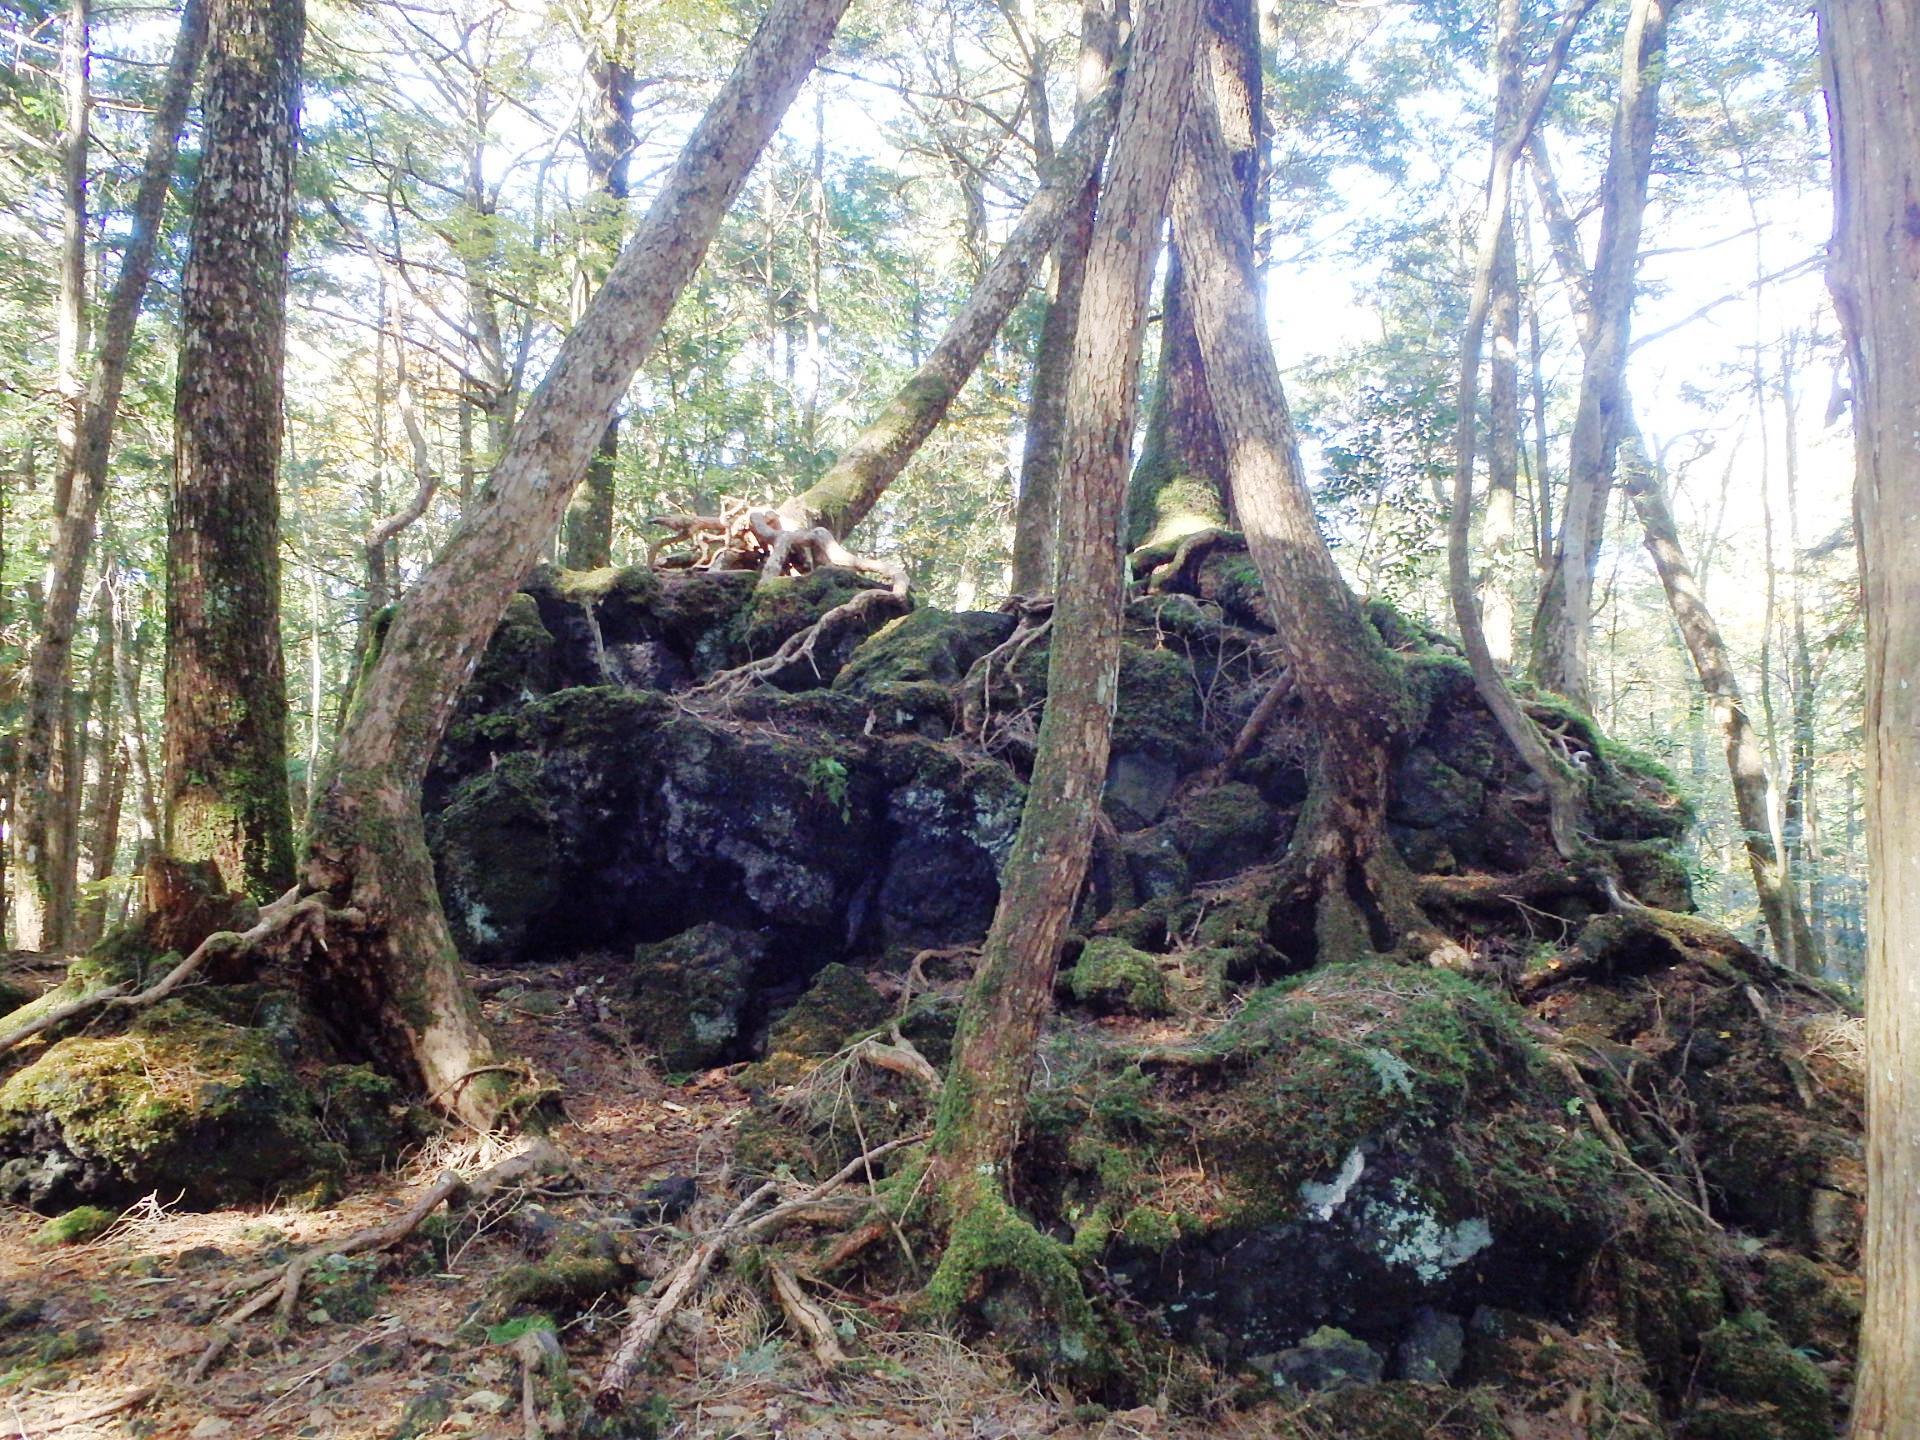 http://www.yamanashi-kankou.jp/blog/L43T9j_9.jpg